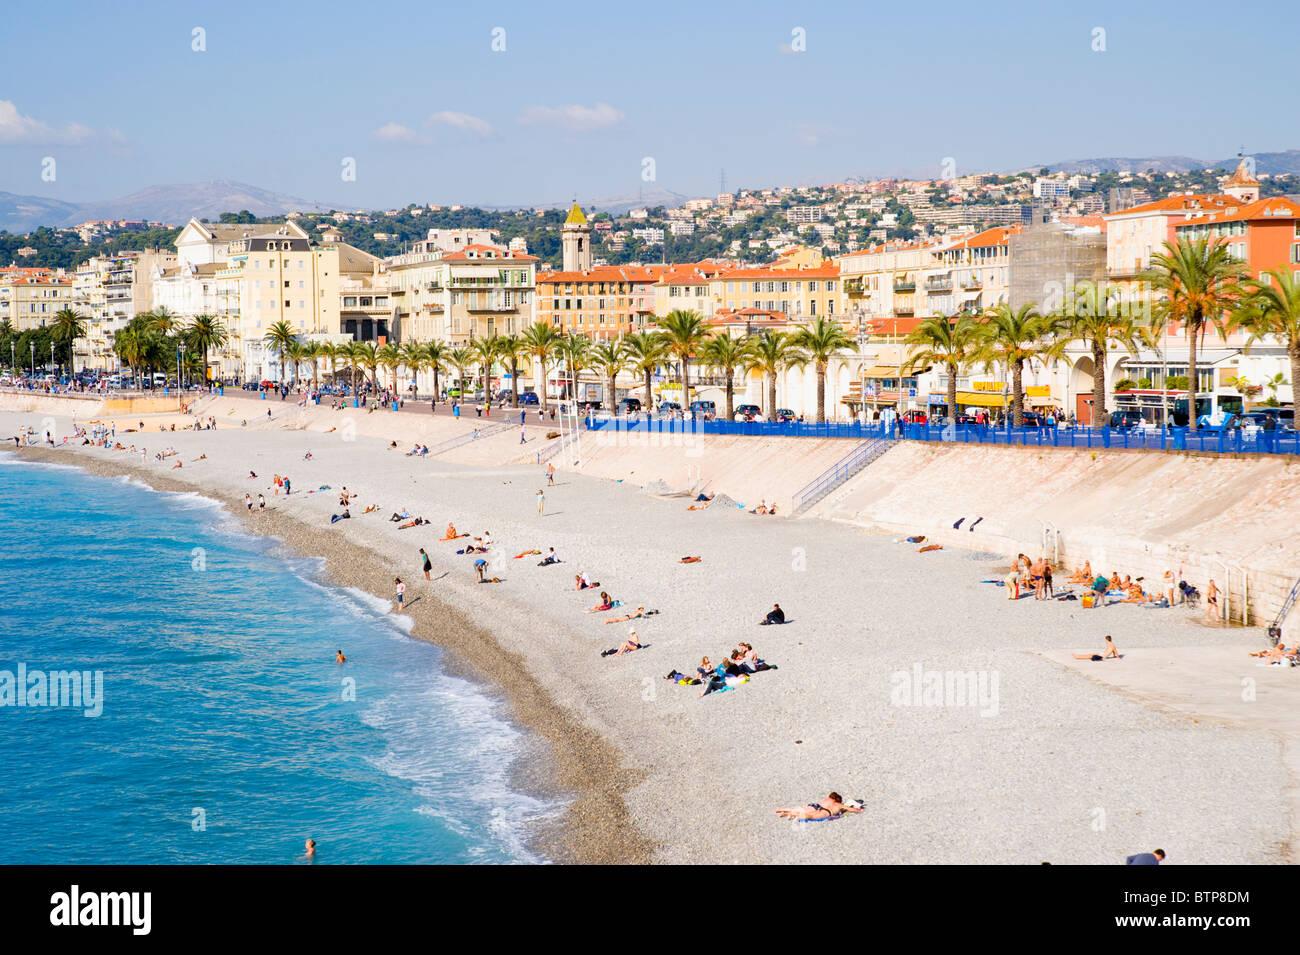 Promenade d'Anglais, Nice, Côte d'Azur, France Photo Stock